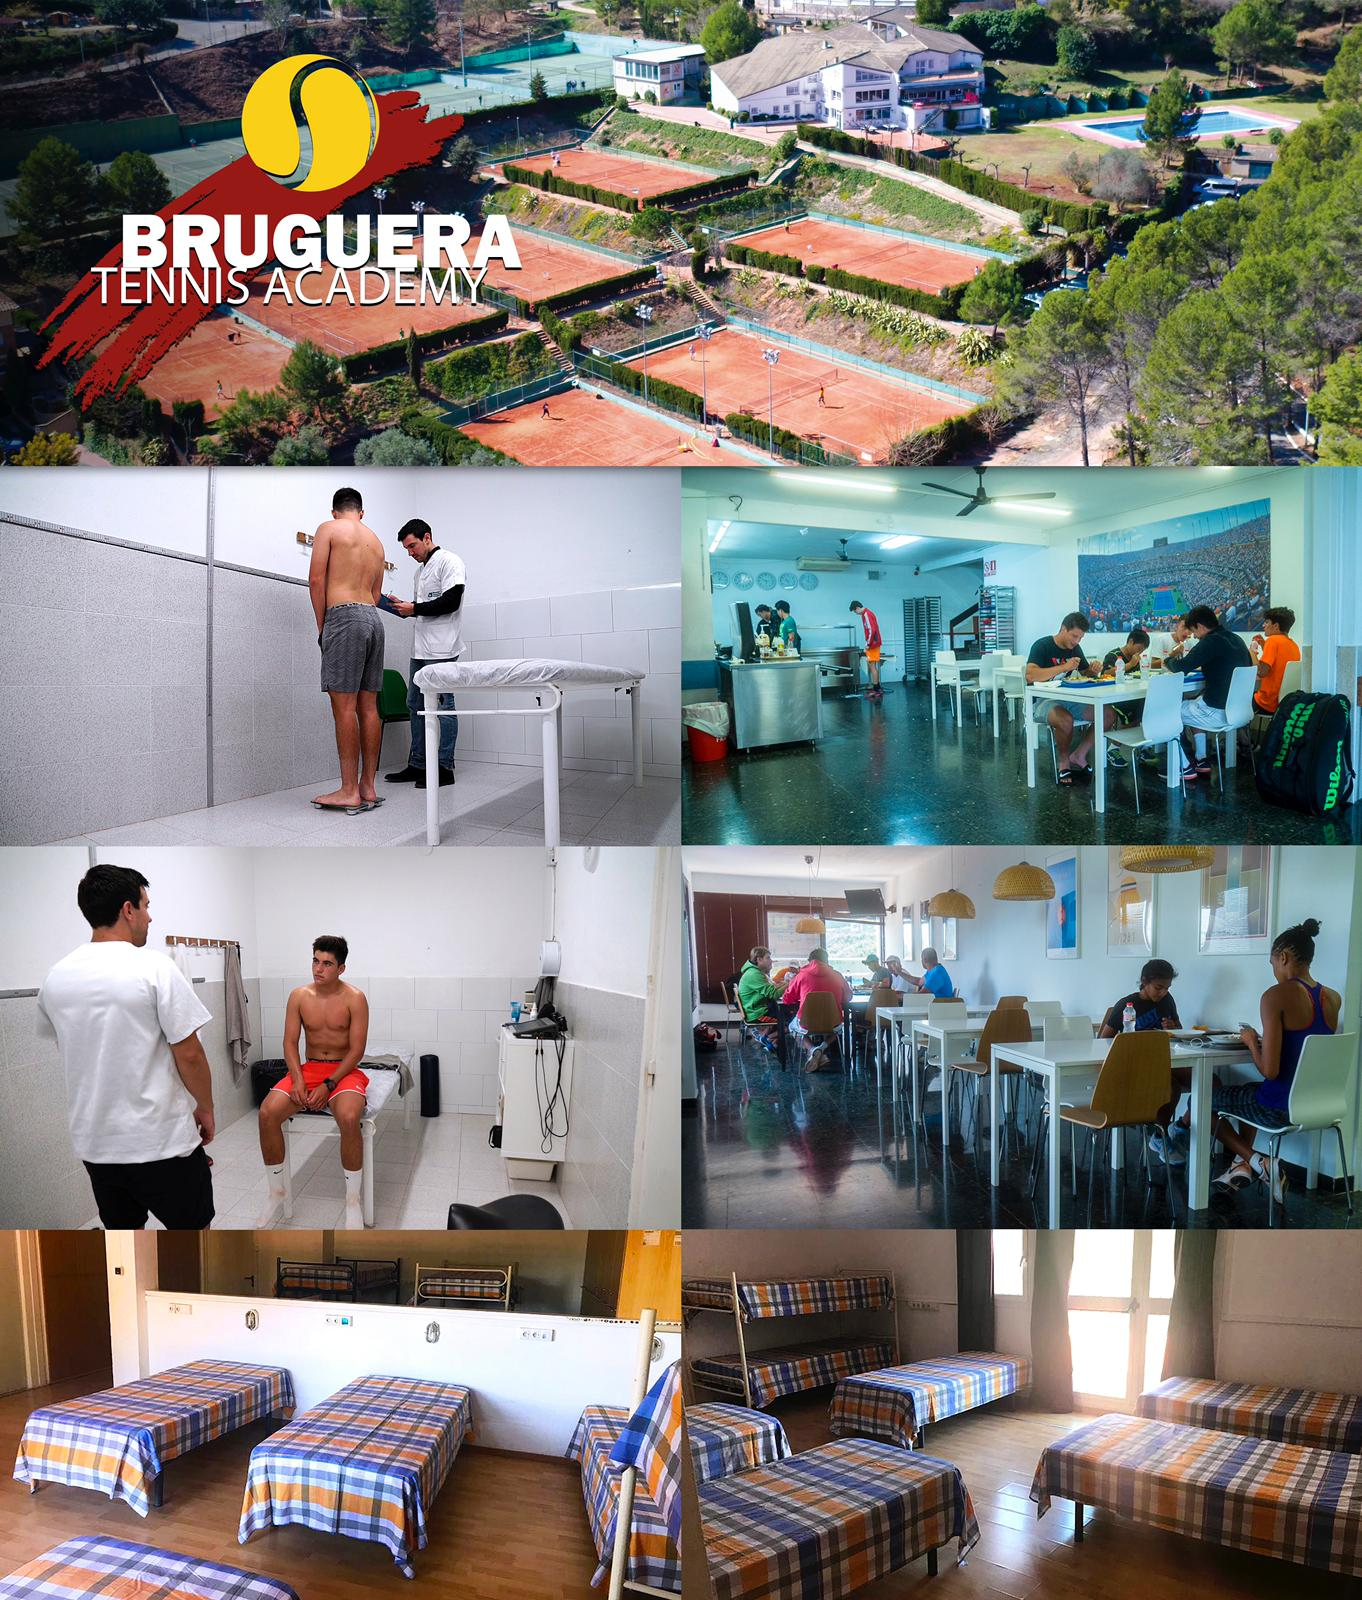 Bruguera High Performance Center of Tennis at Barcelona